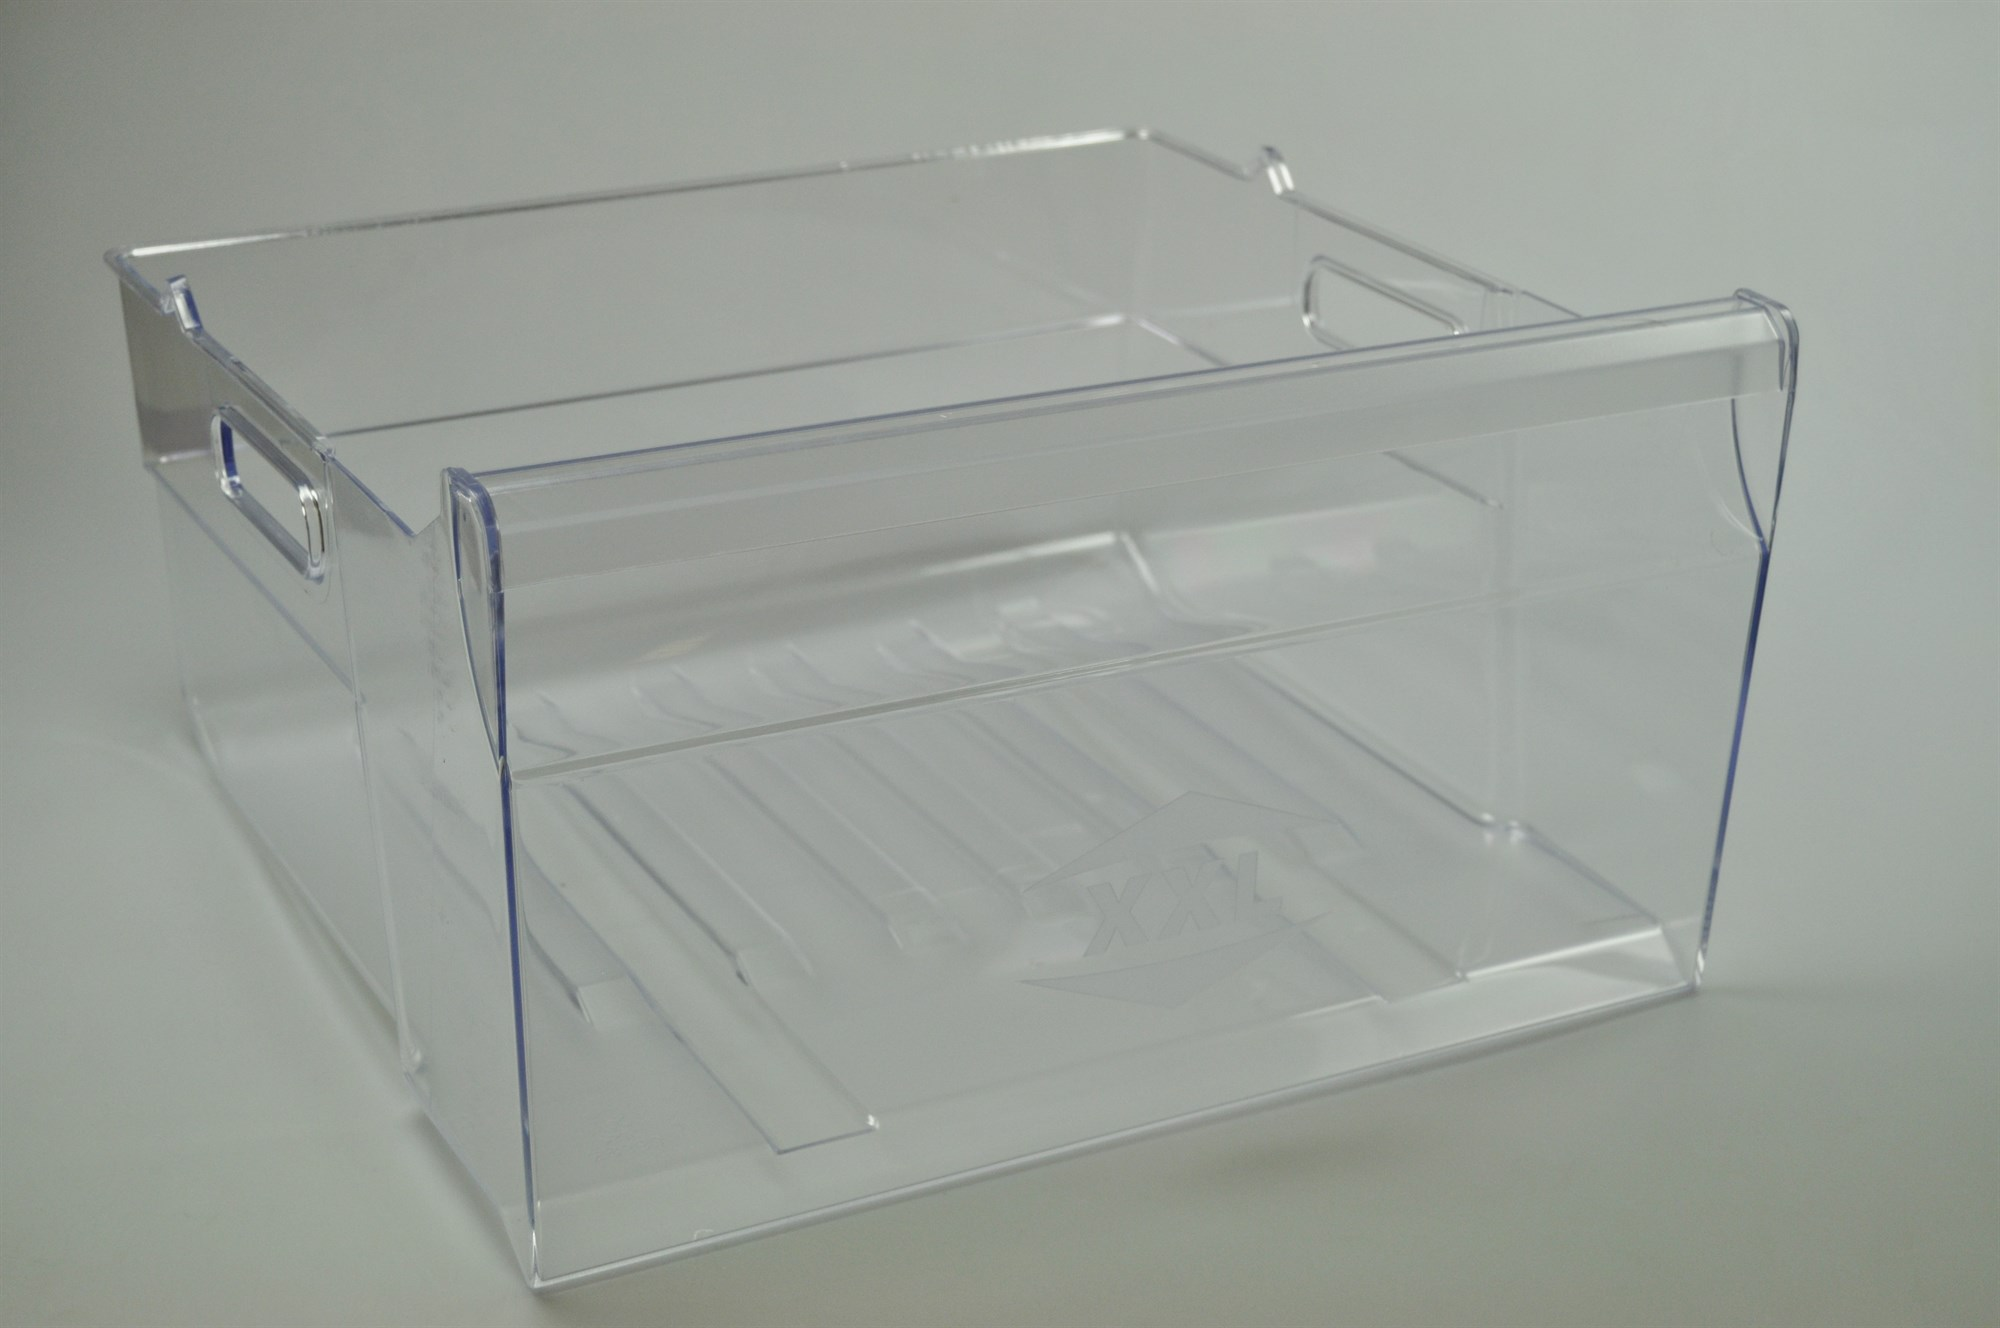 bac cong lateur whirlpool frigo cong lateur 240 mm x 435 mm x 400 mm. Black Bedroom Furniture Sets. Home Design Ideas